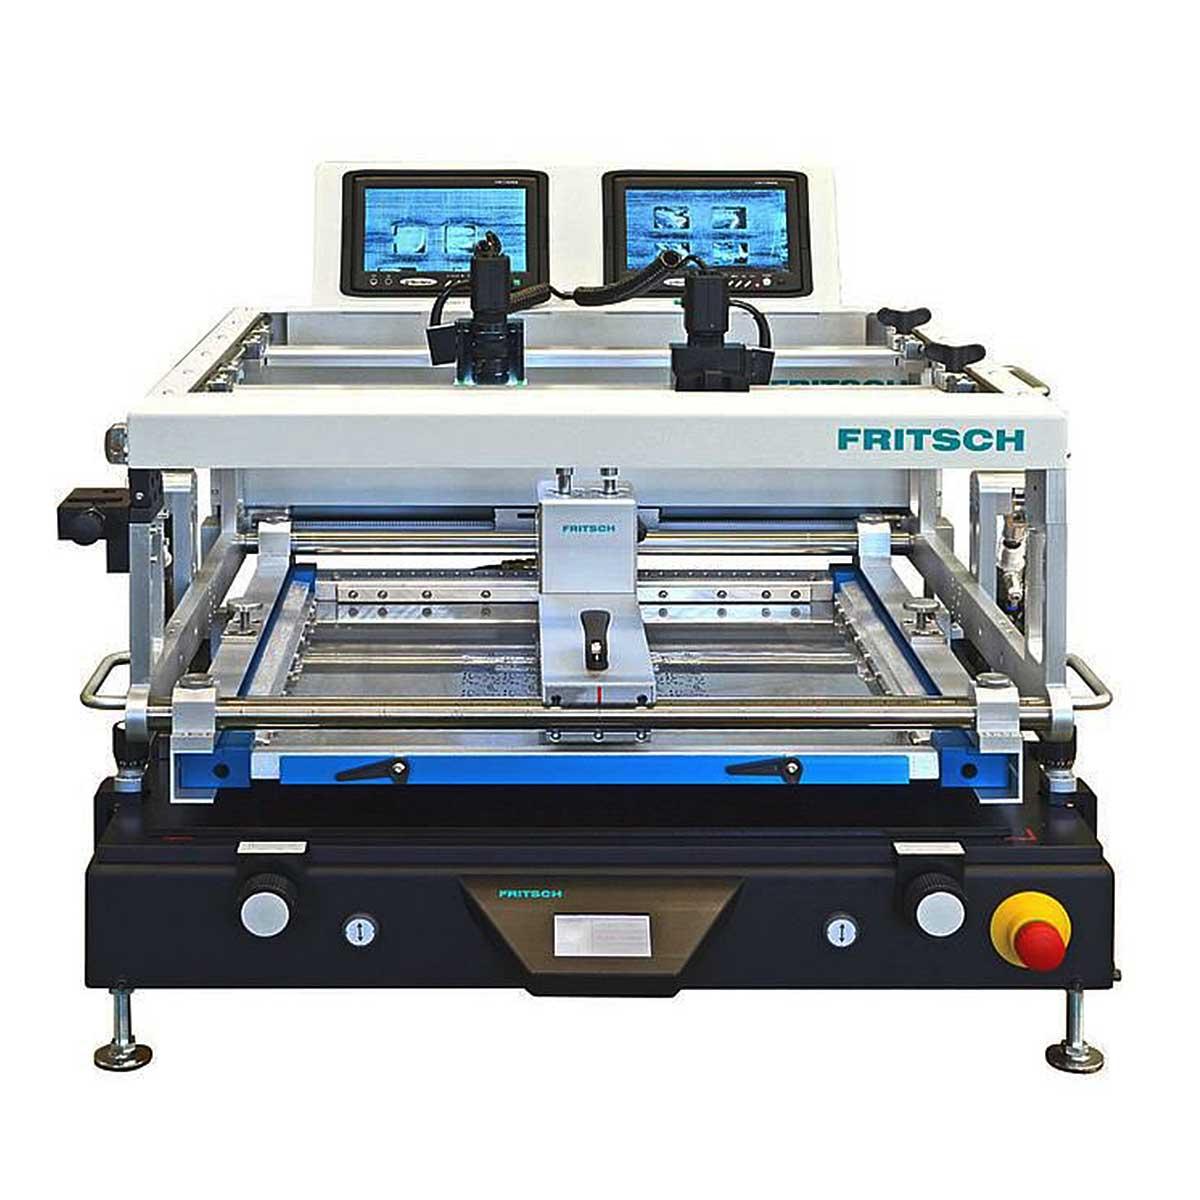 FRITSCH printALL 210 ꜛ полуавтомат трафаретной печати